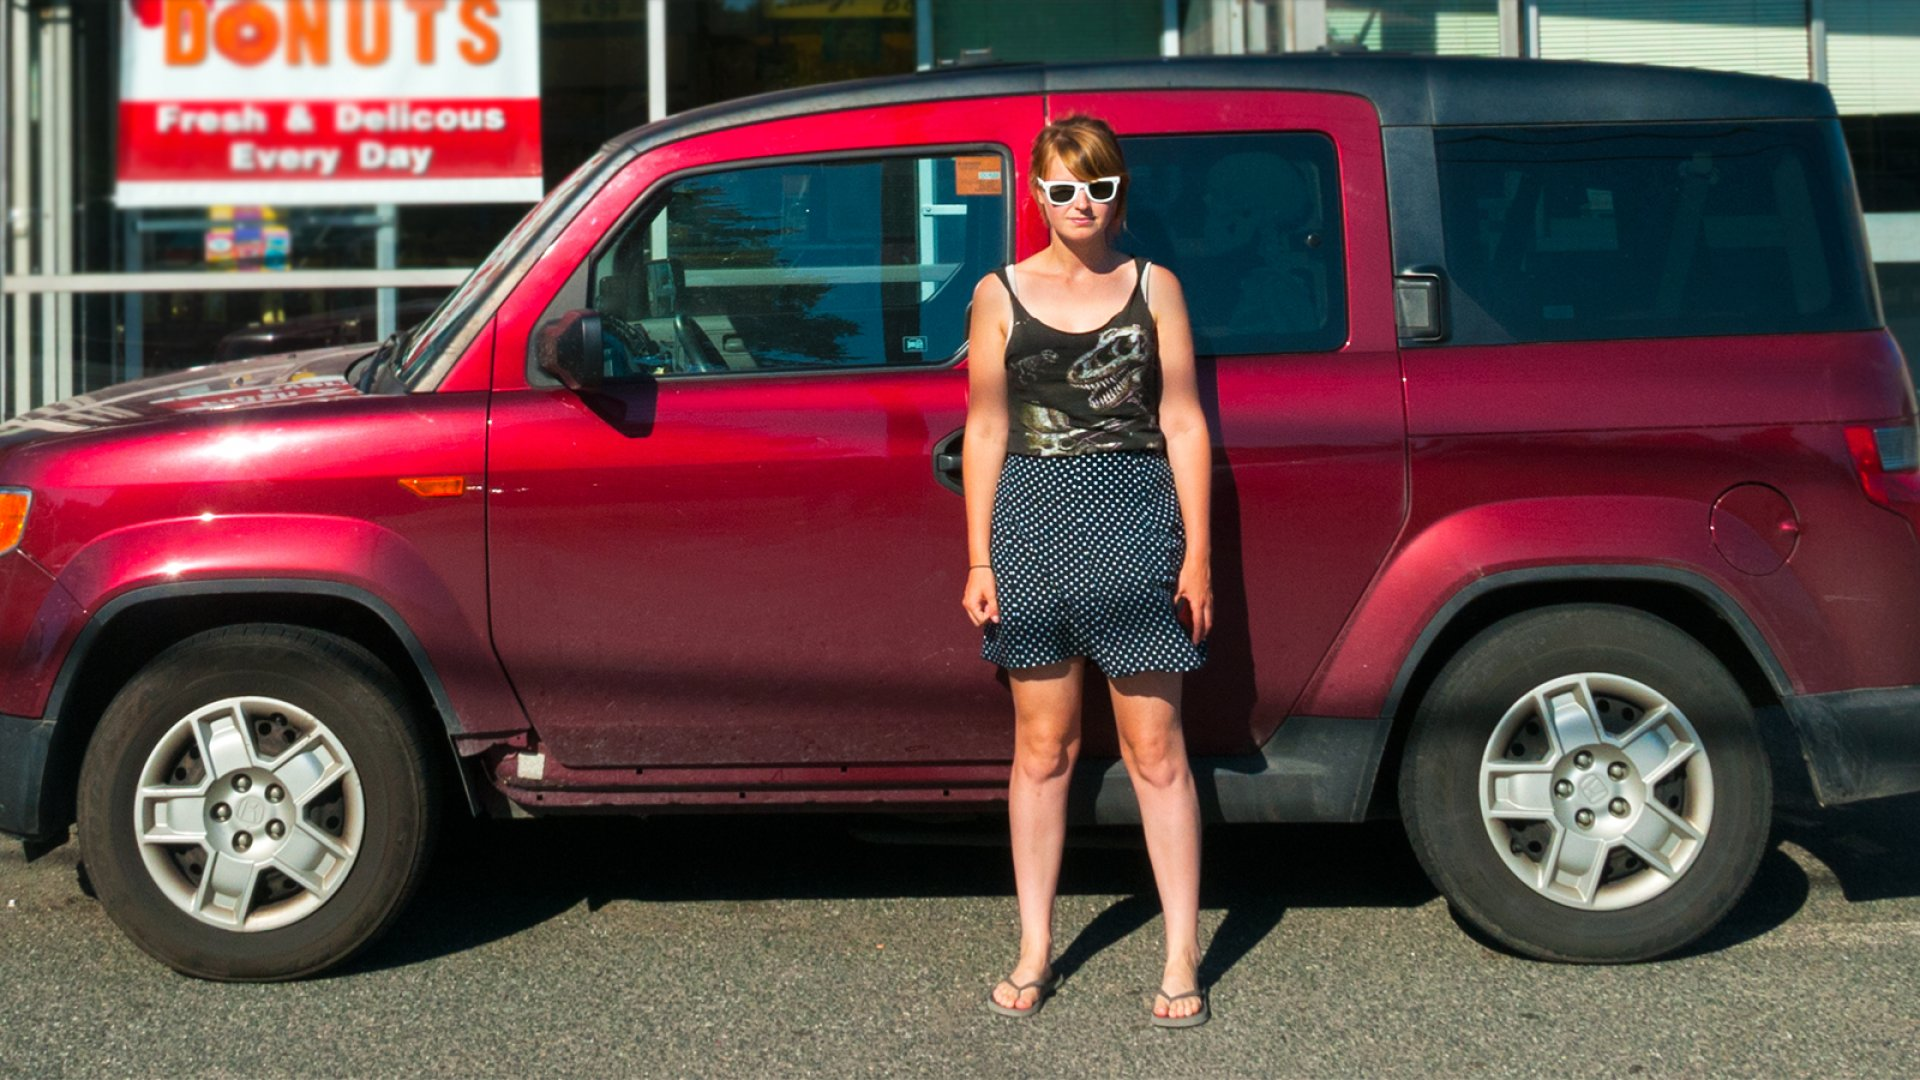 Femtrepreneur founder Mariah Coz in front of her 35-square-foot home.